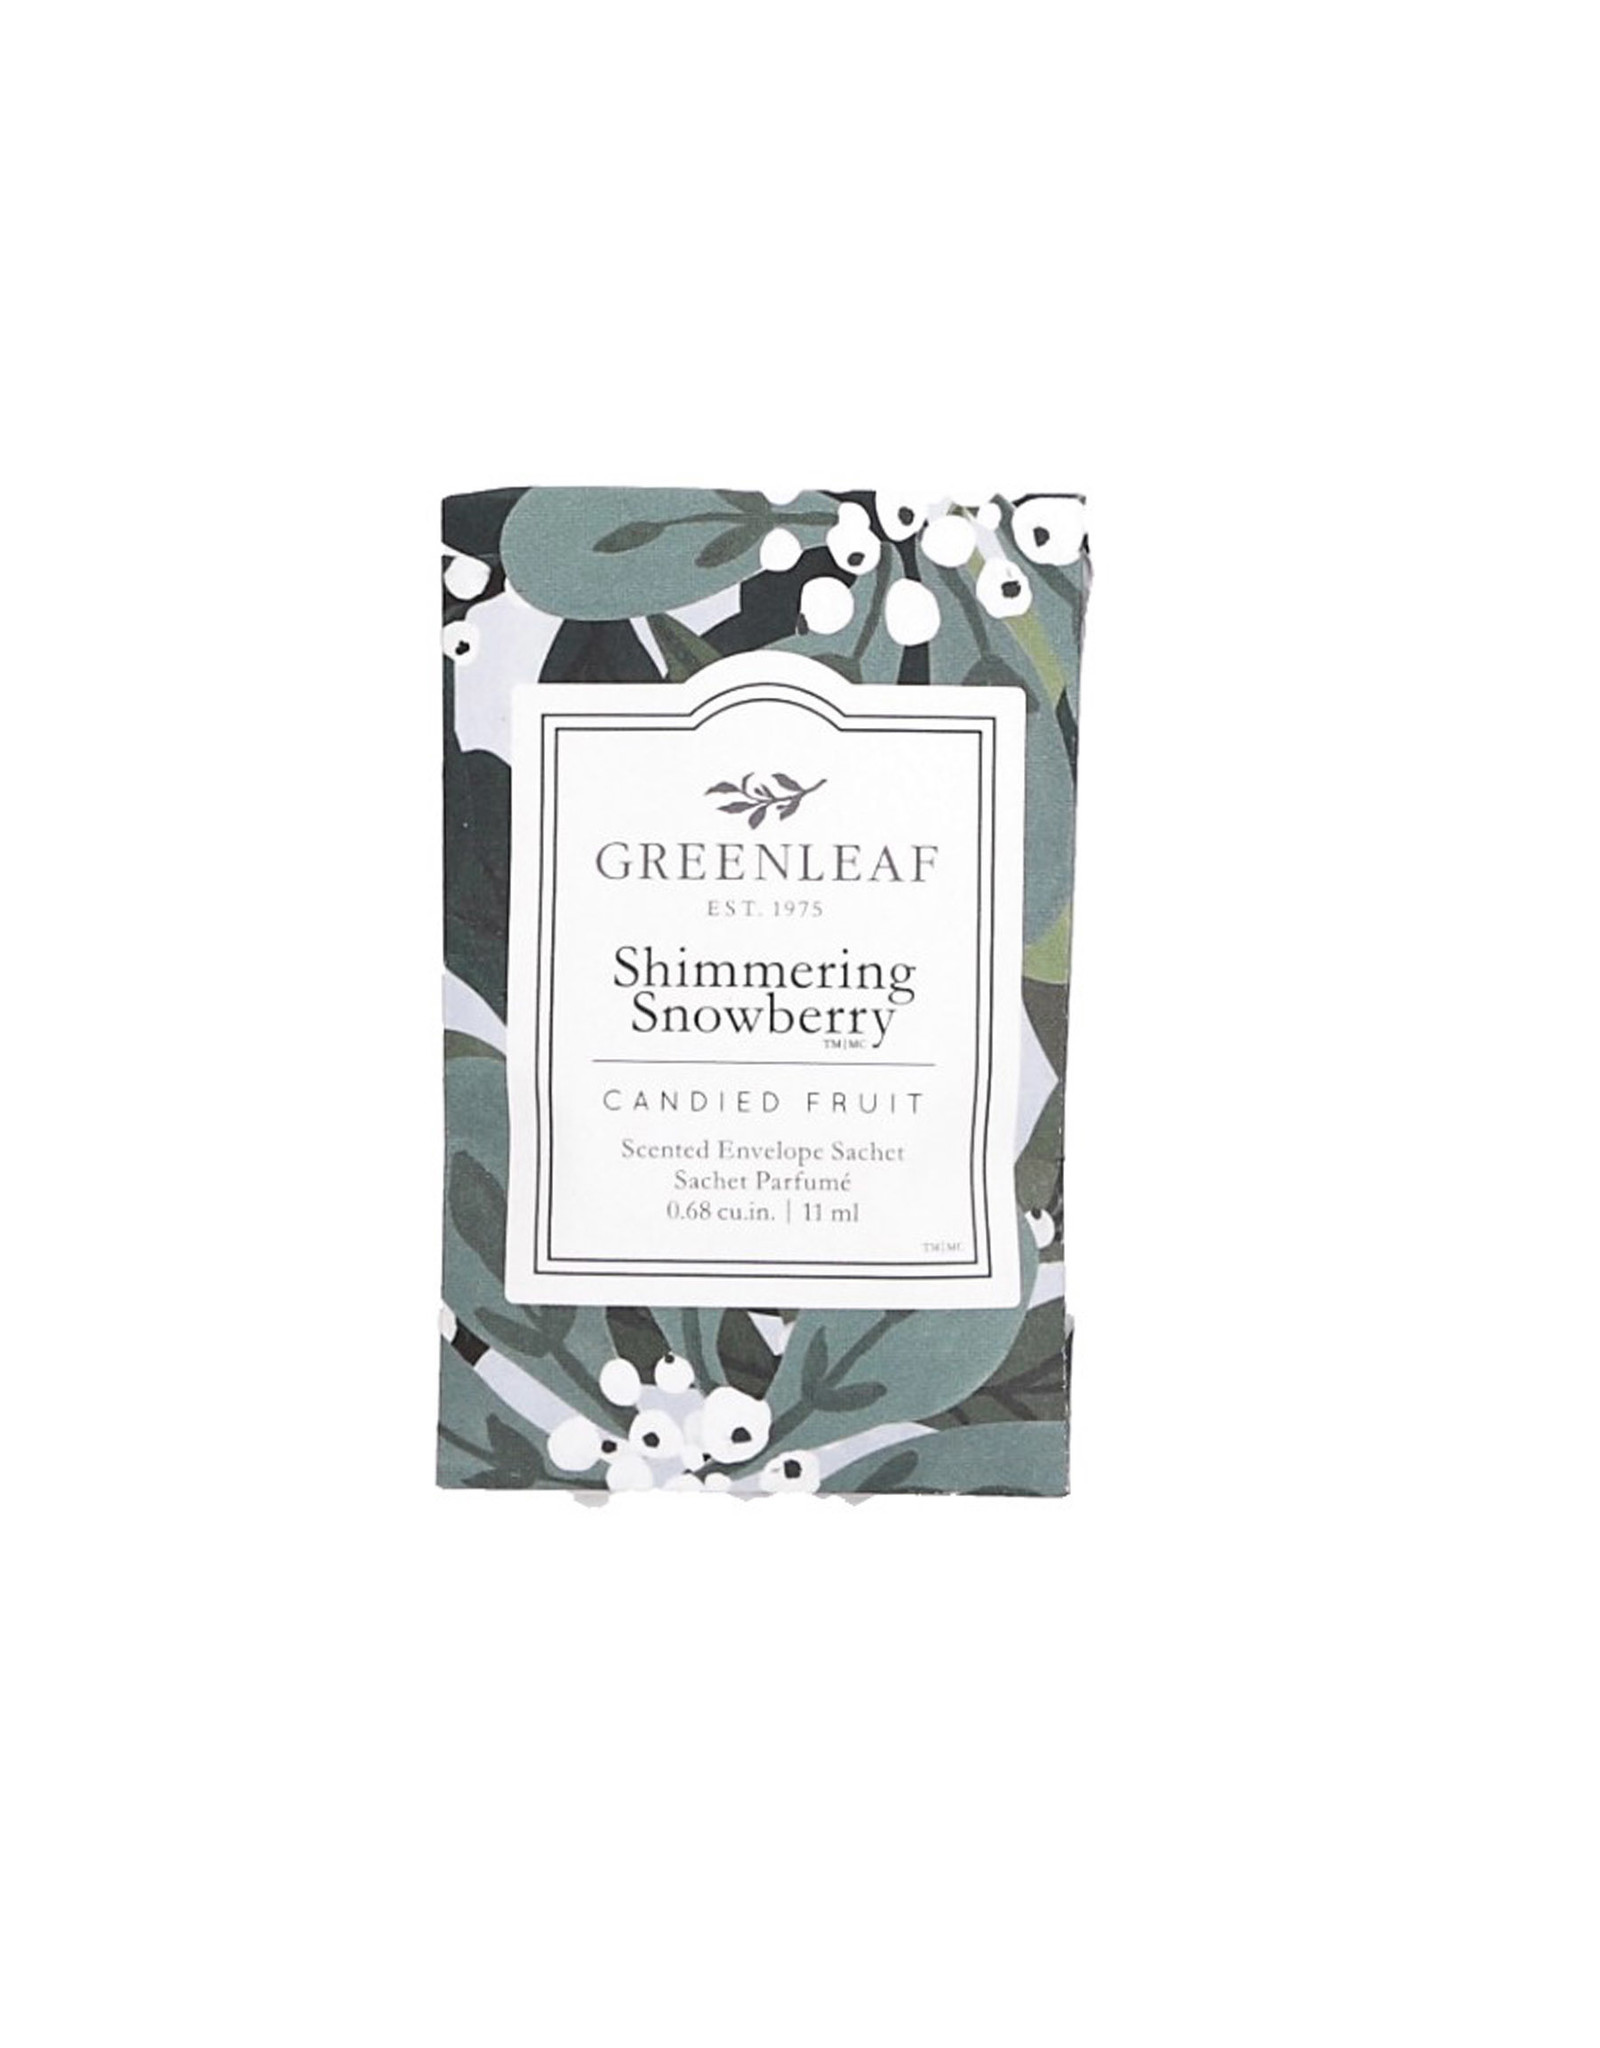 Greenleaf Shimmering Snowberry Sachet Small